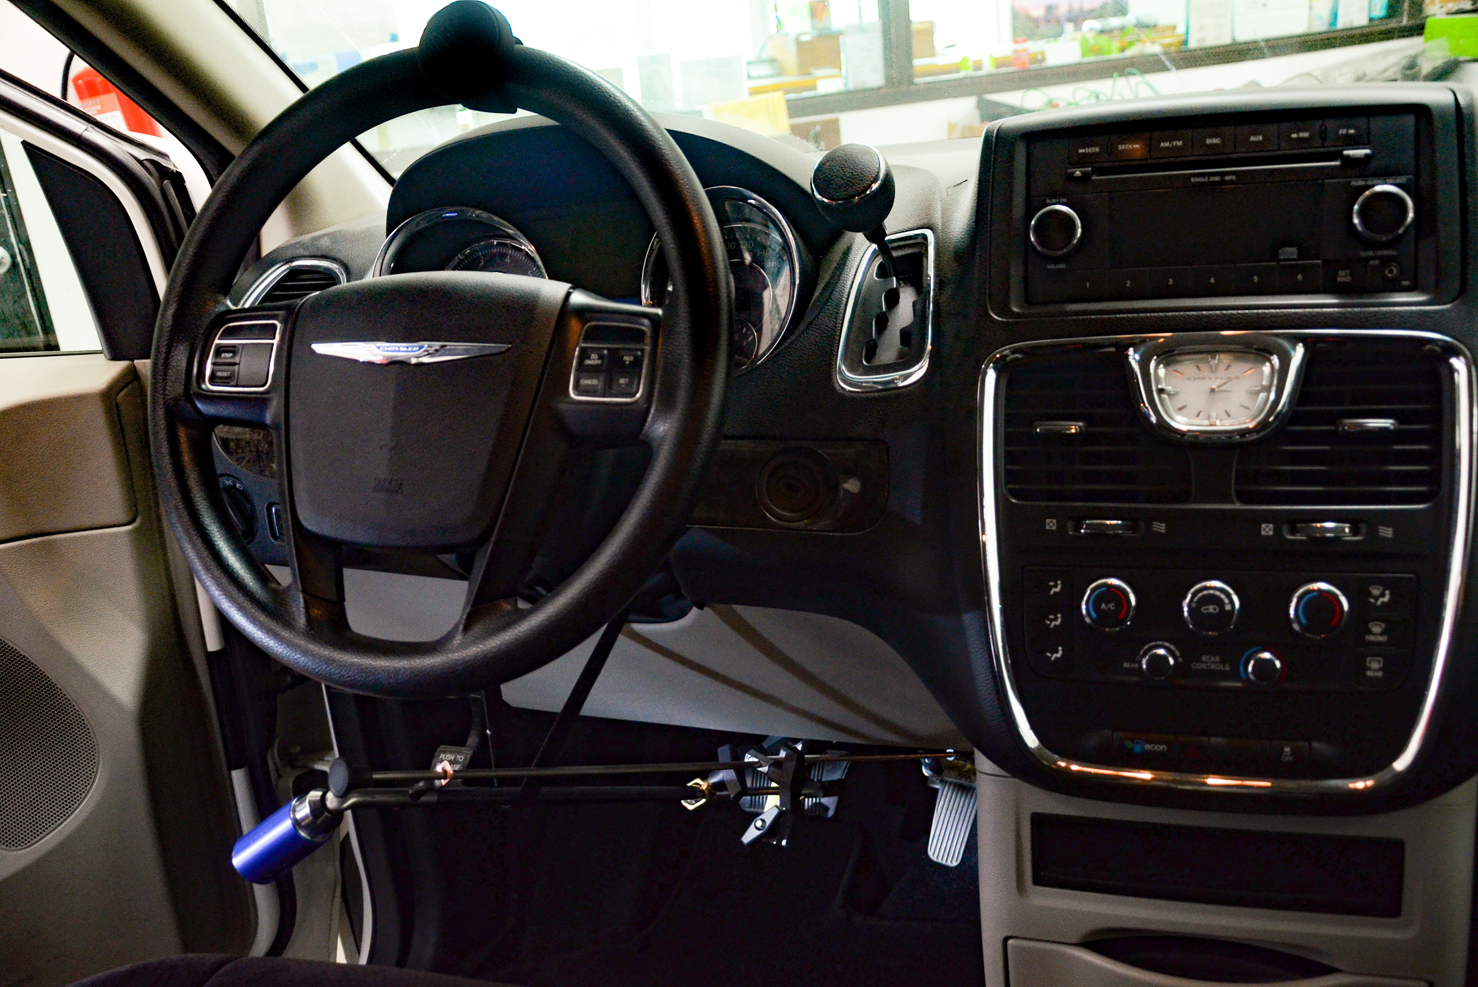 Controles manuales y perillas giratorias | Chrysler Town & Country